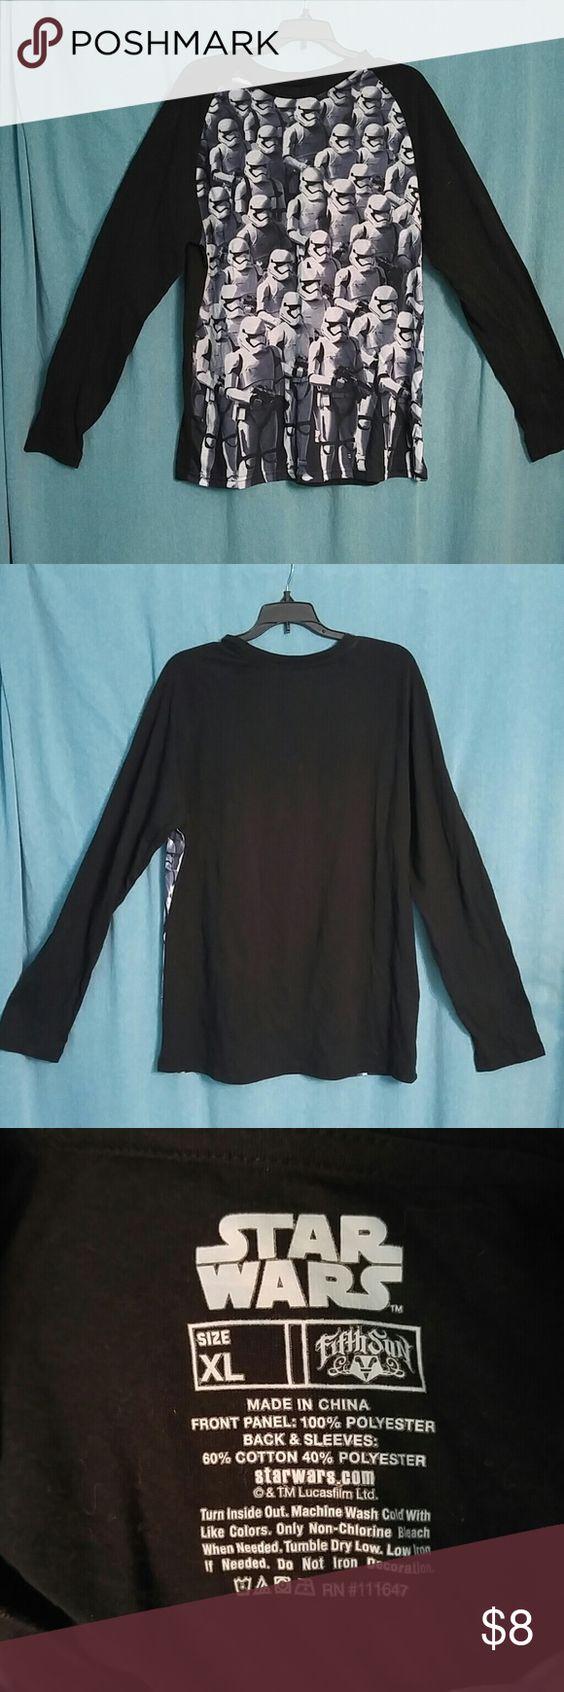 Black t shirts kohls - Star Wars Stormtroopers T Shirt Kohl S Brand Star Wars T Shirt Stormtroopers Baseball